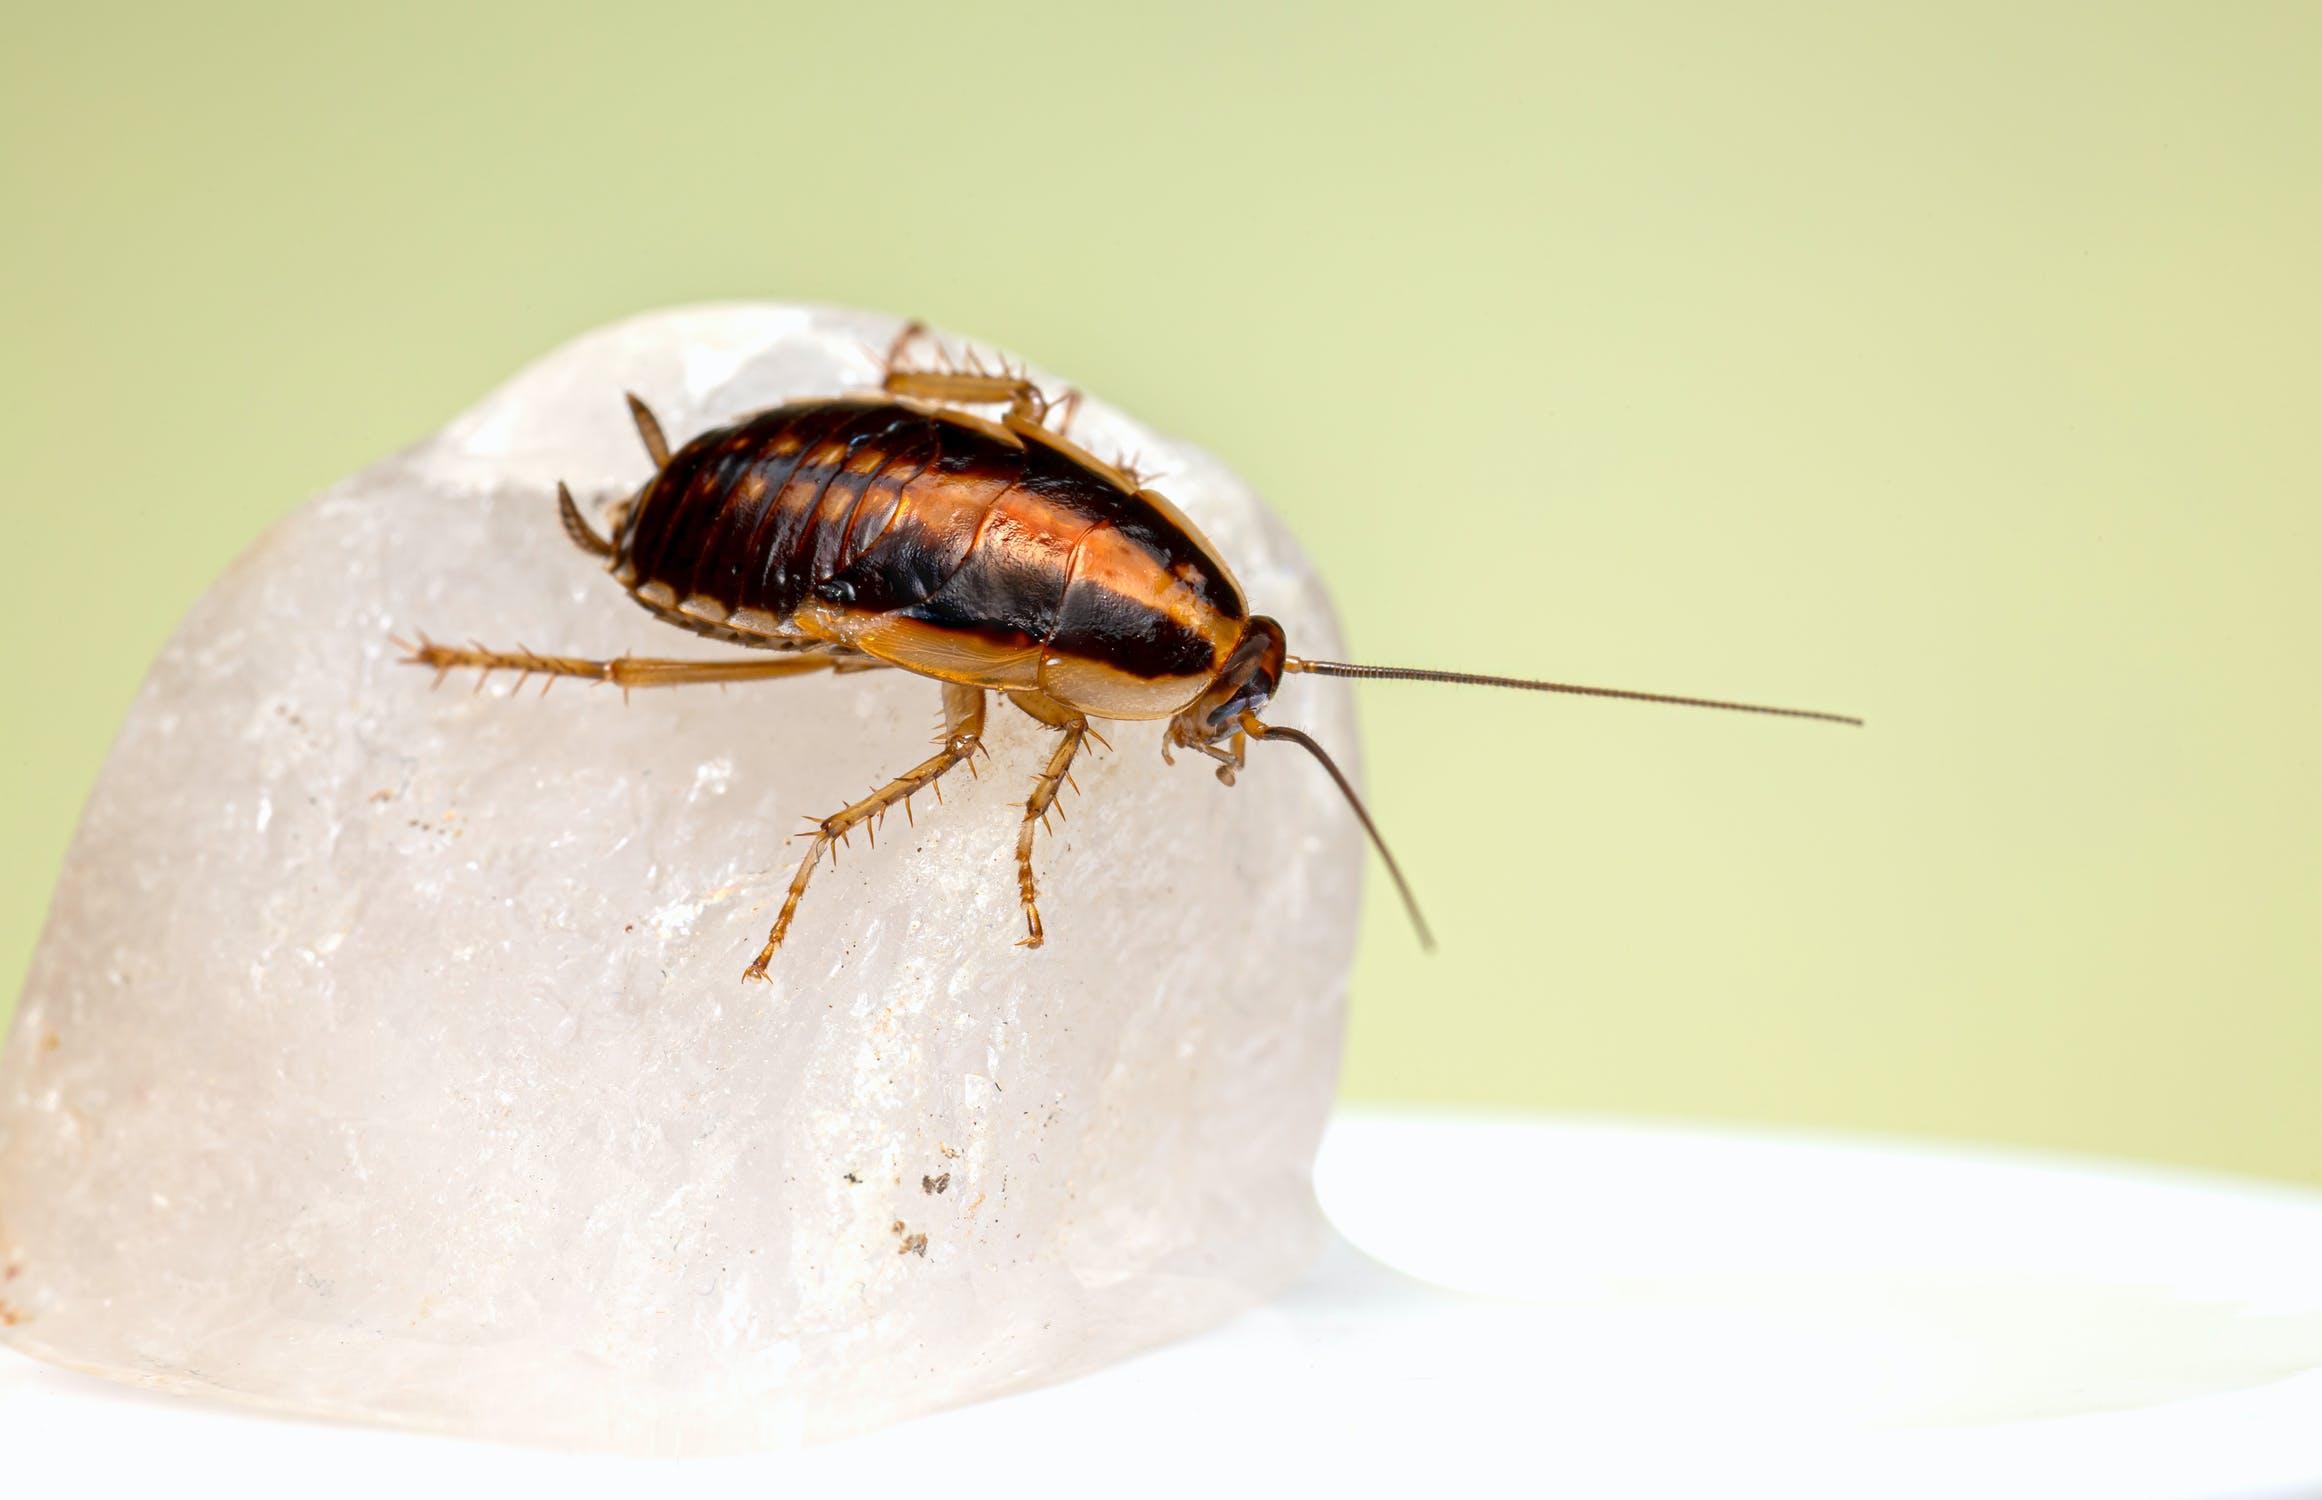 Россиян предупредили о нашествии тараканов  - новости Афанасий